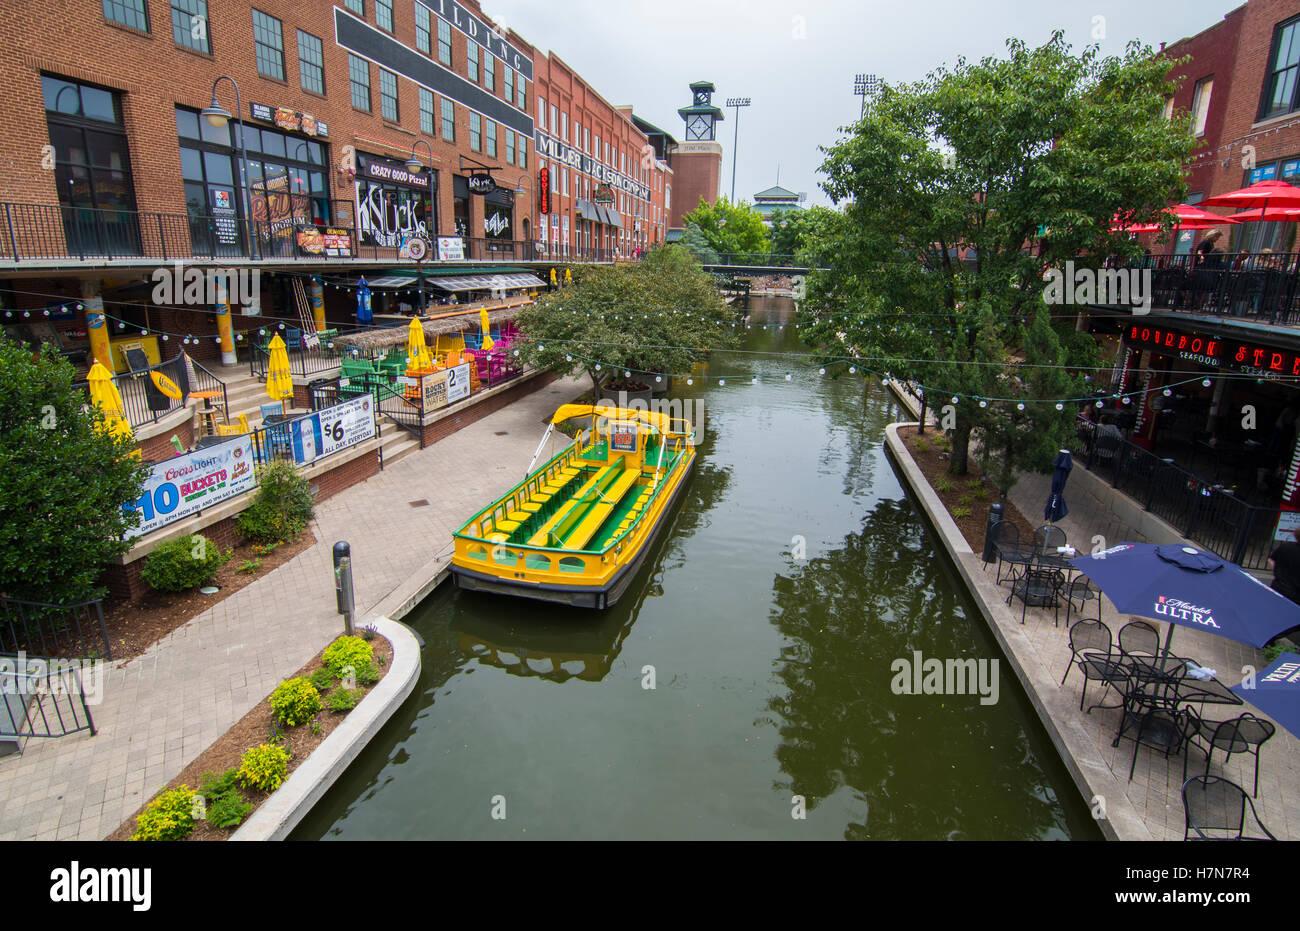 Oklahoma City Oklahoma OKC Bricktown Canal with boats and restaurants downtown - Stock Image